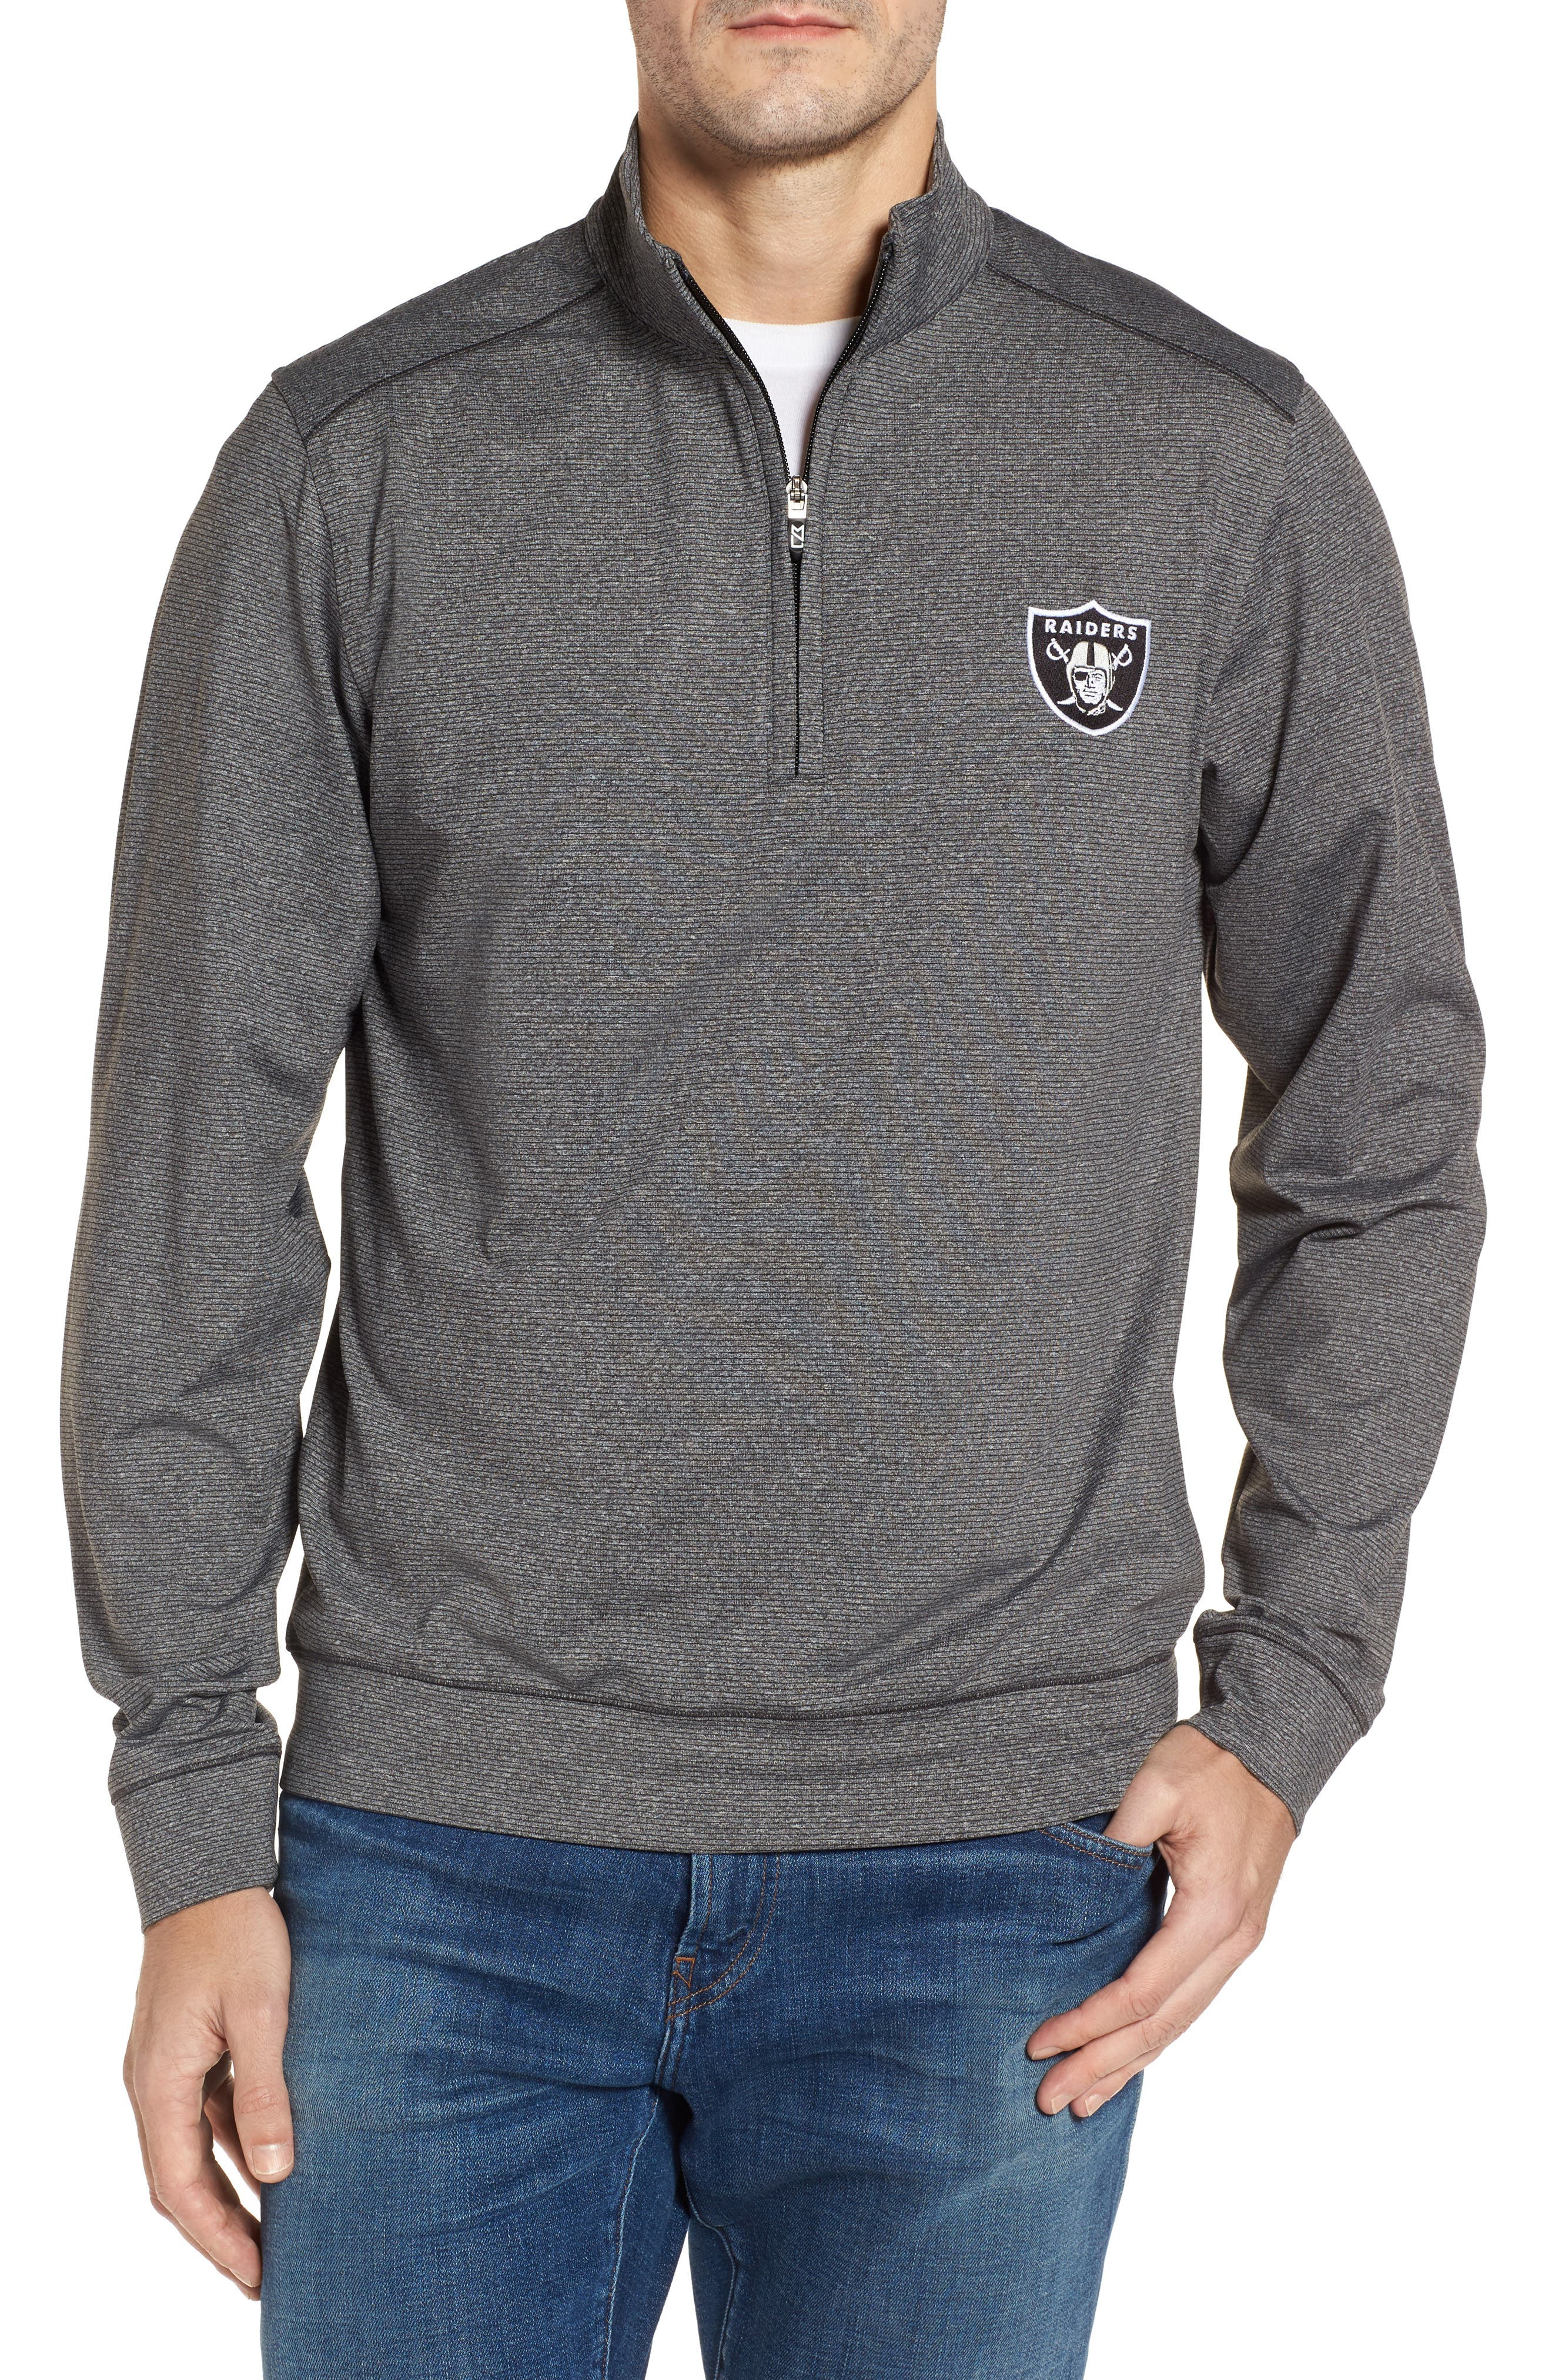 Main Image - Cutter & Buck Shoreline - Oakland Raiders Half Zip Pullover